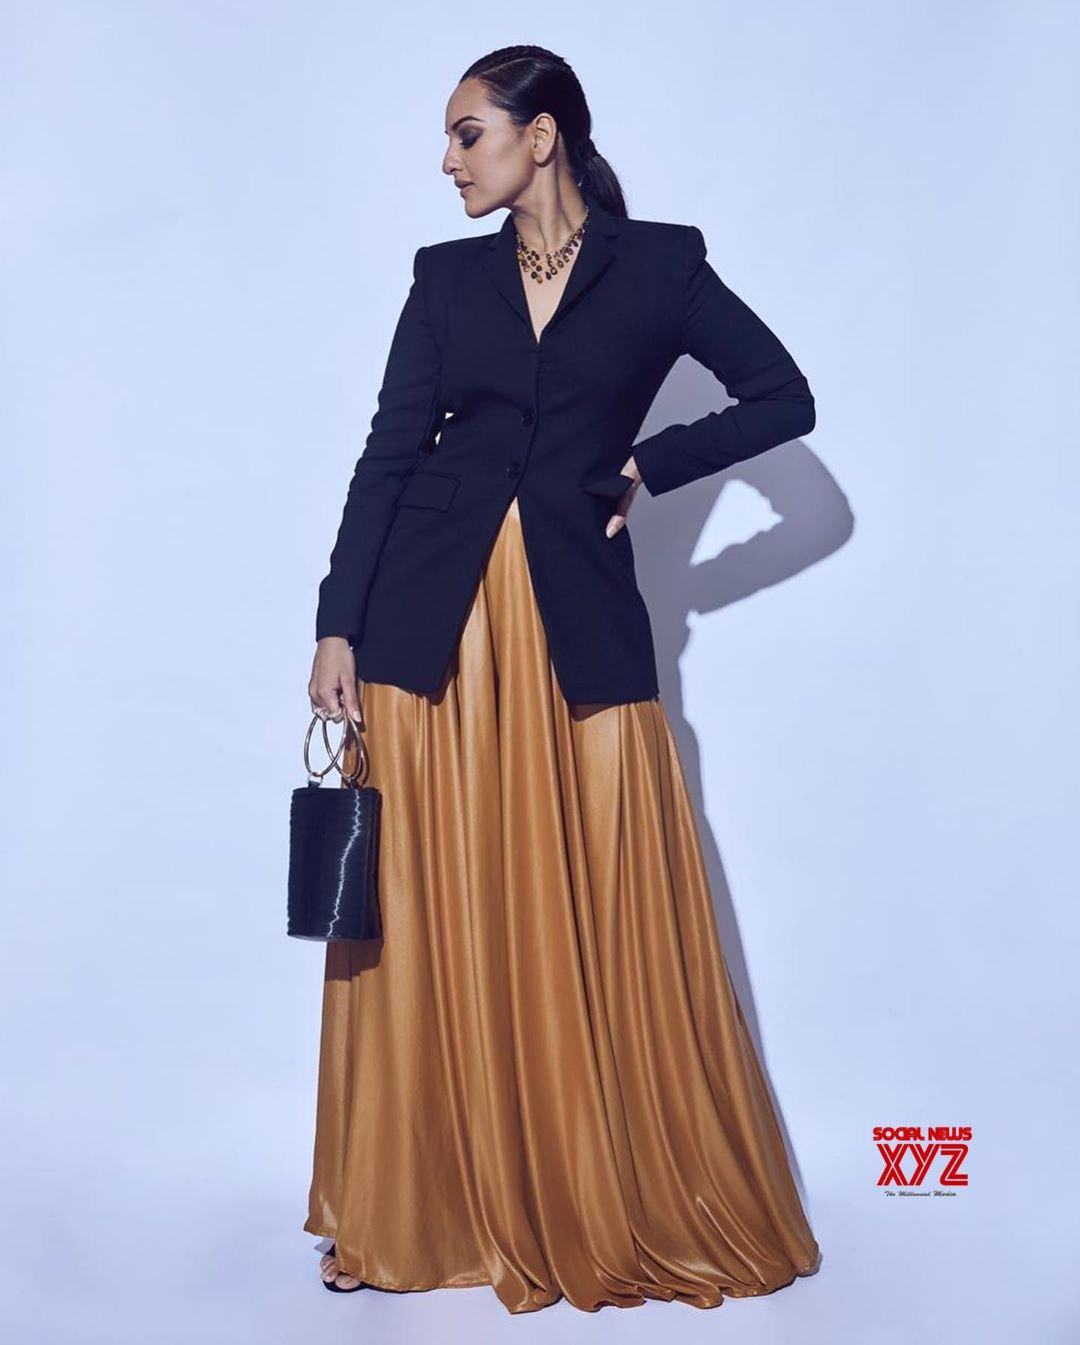 Actress Sonakshi Sinha Glam Stills From Myntra Fashion Superstar